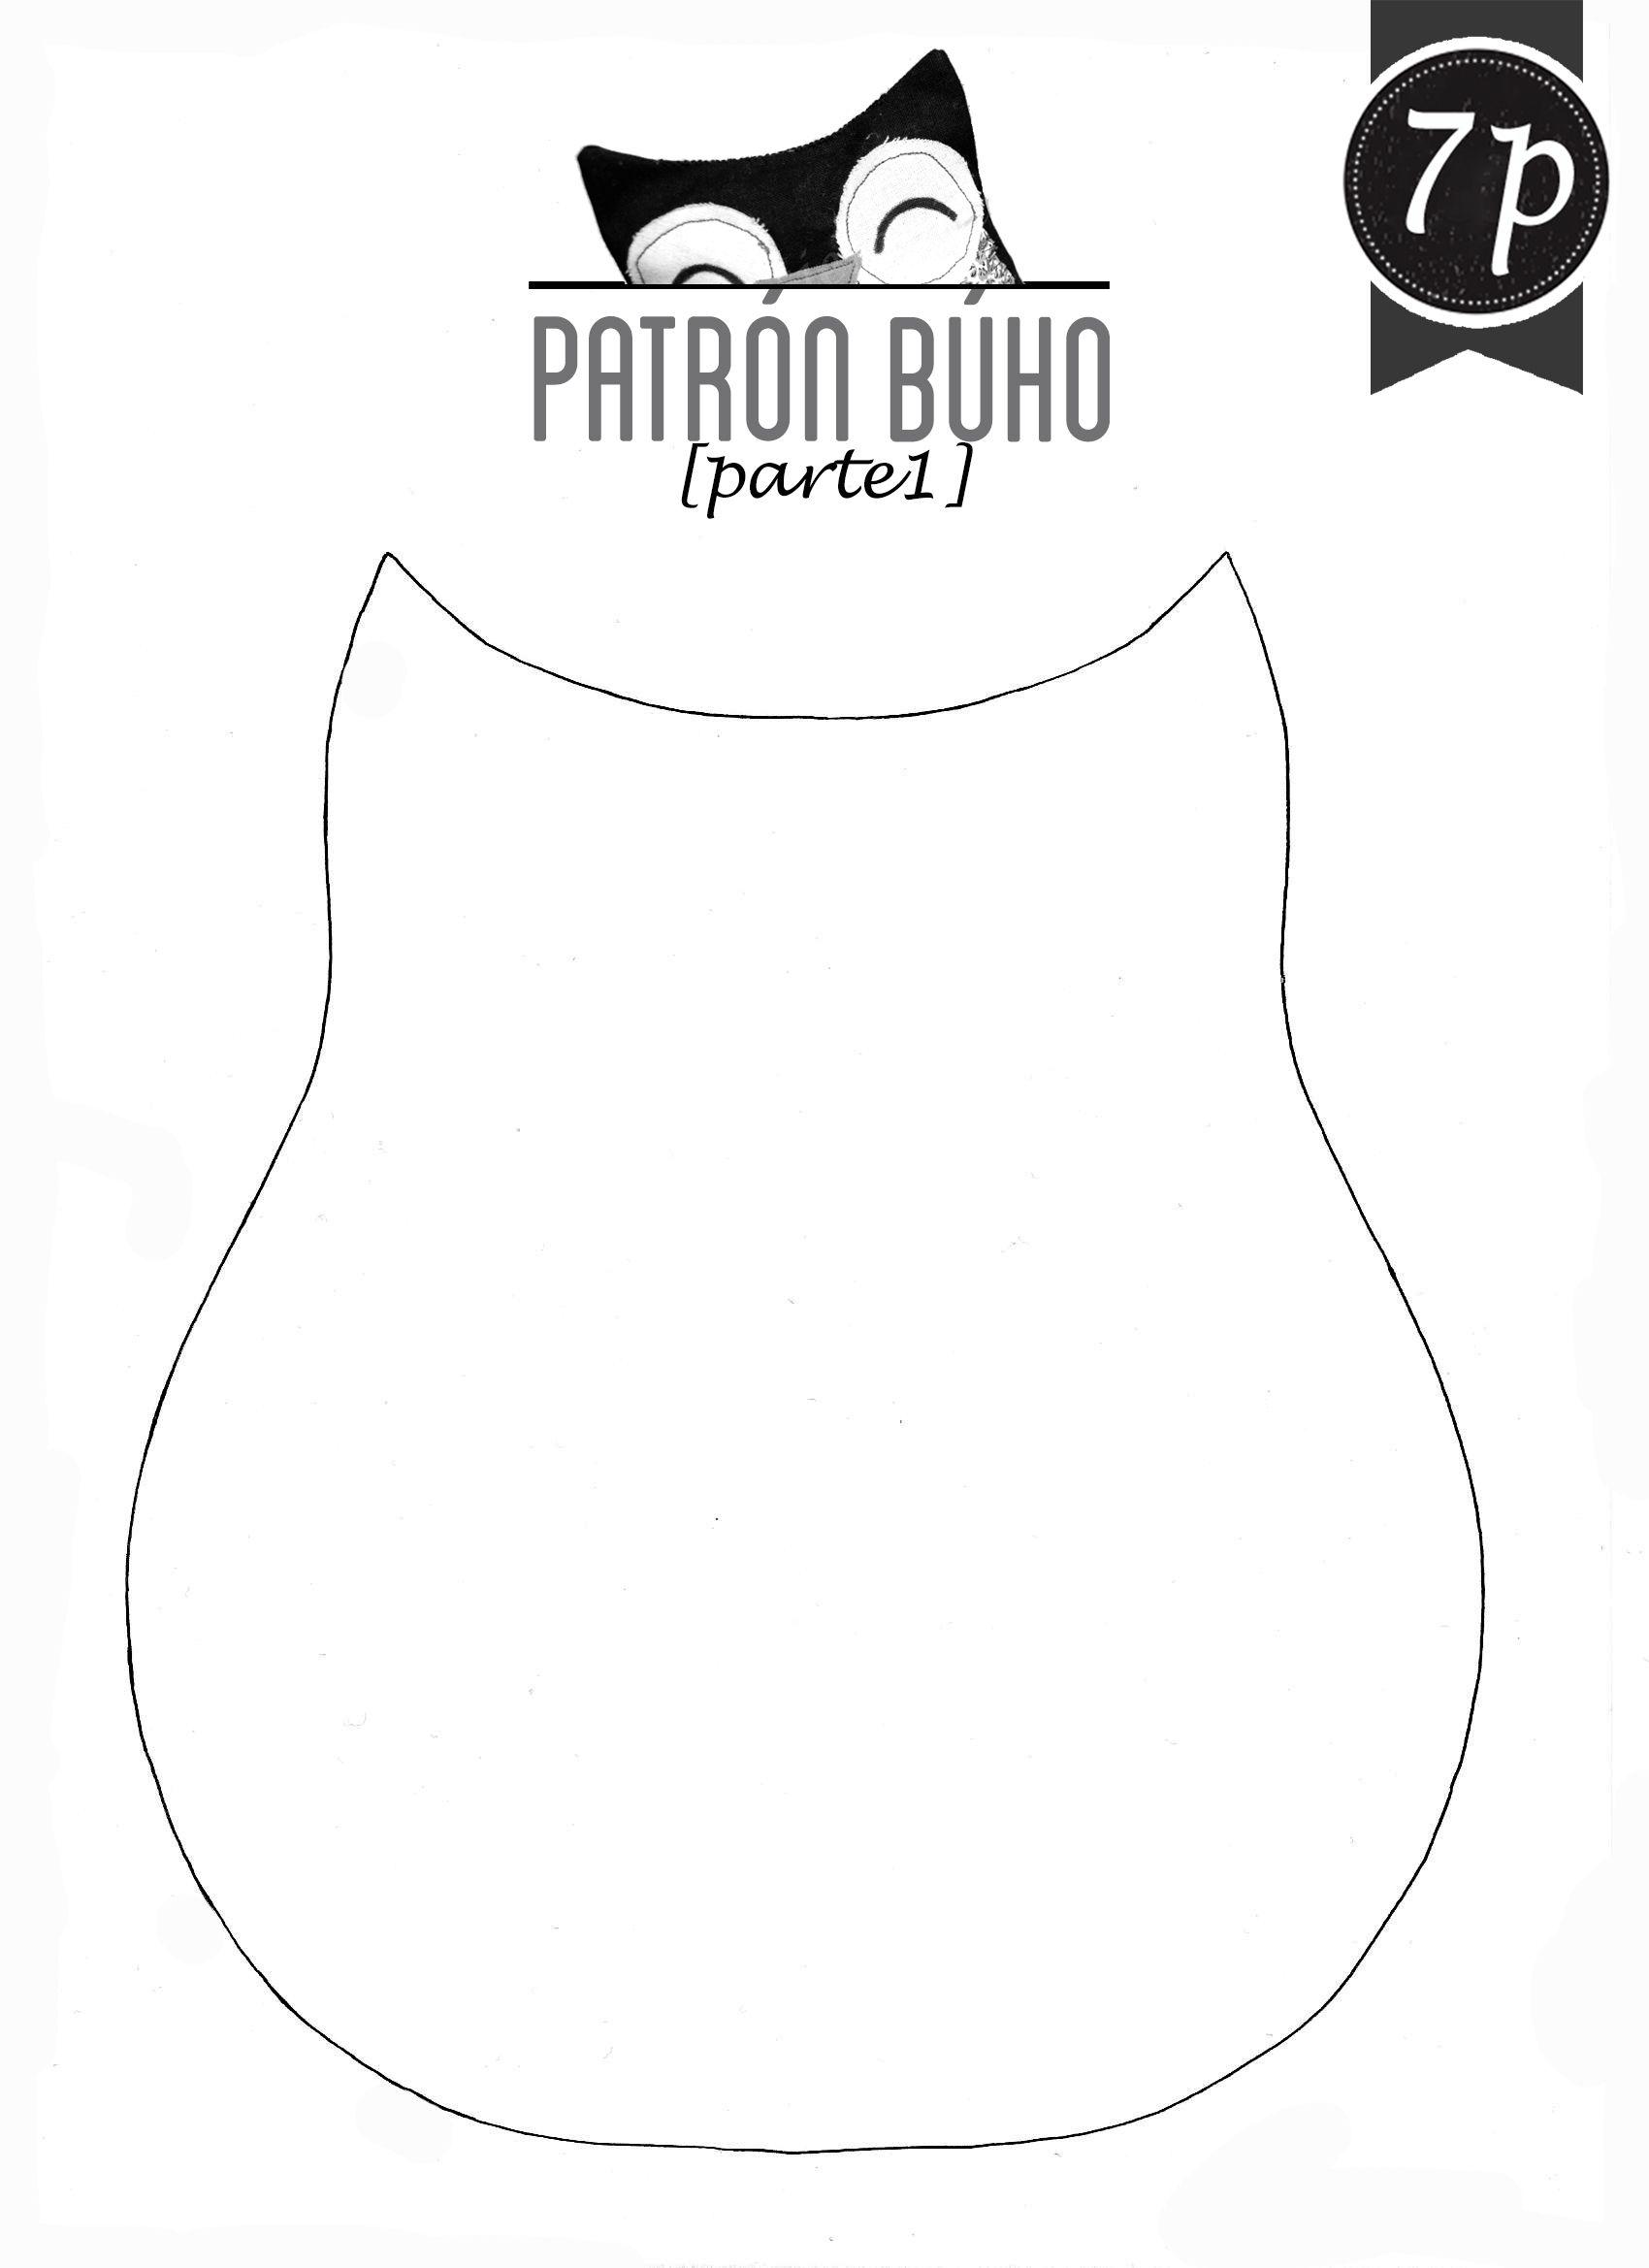 Patrones o moldes de buhos en tela - Imagui | bordado | Pinterest ...